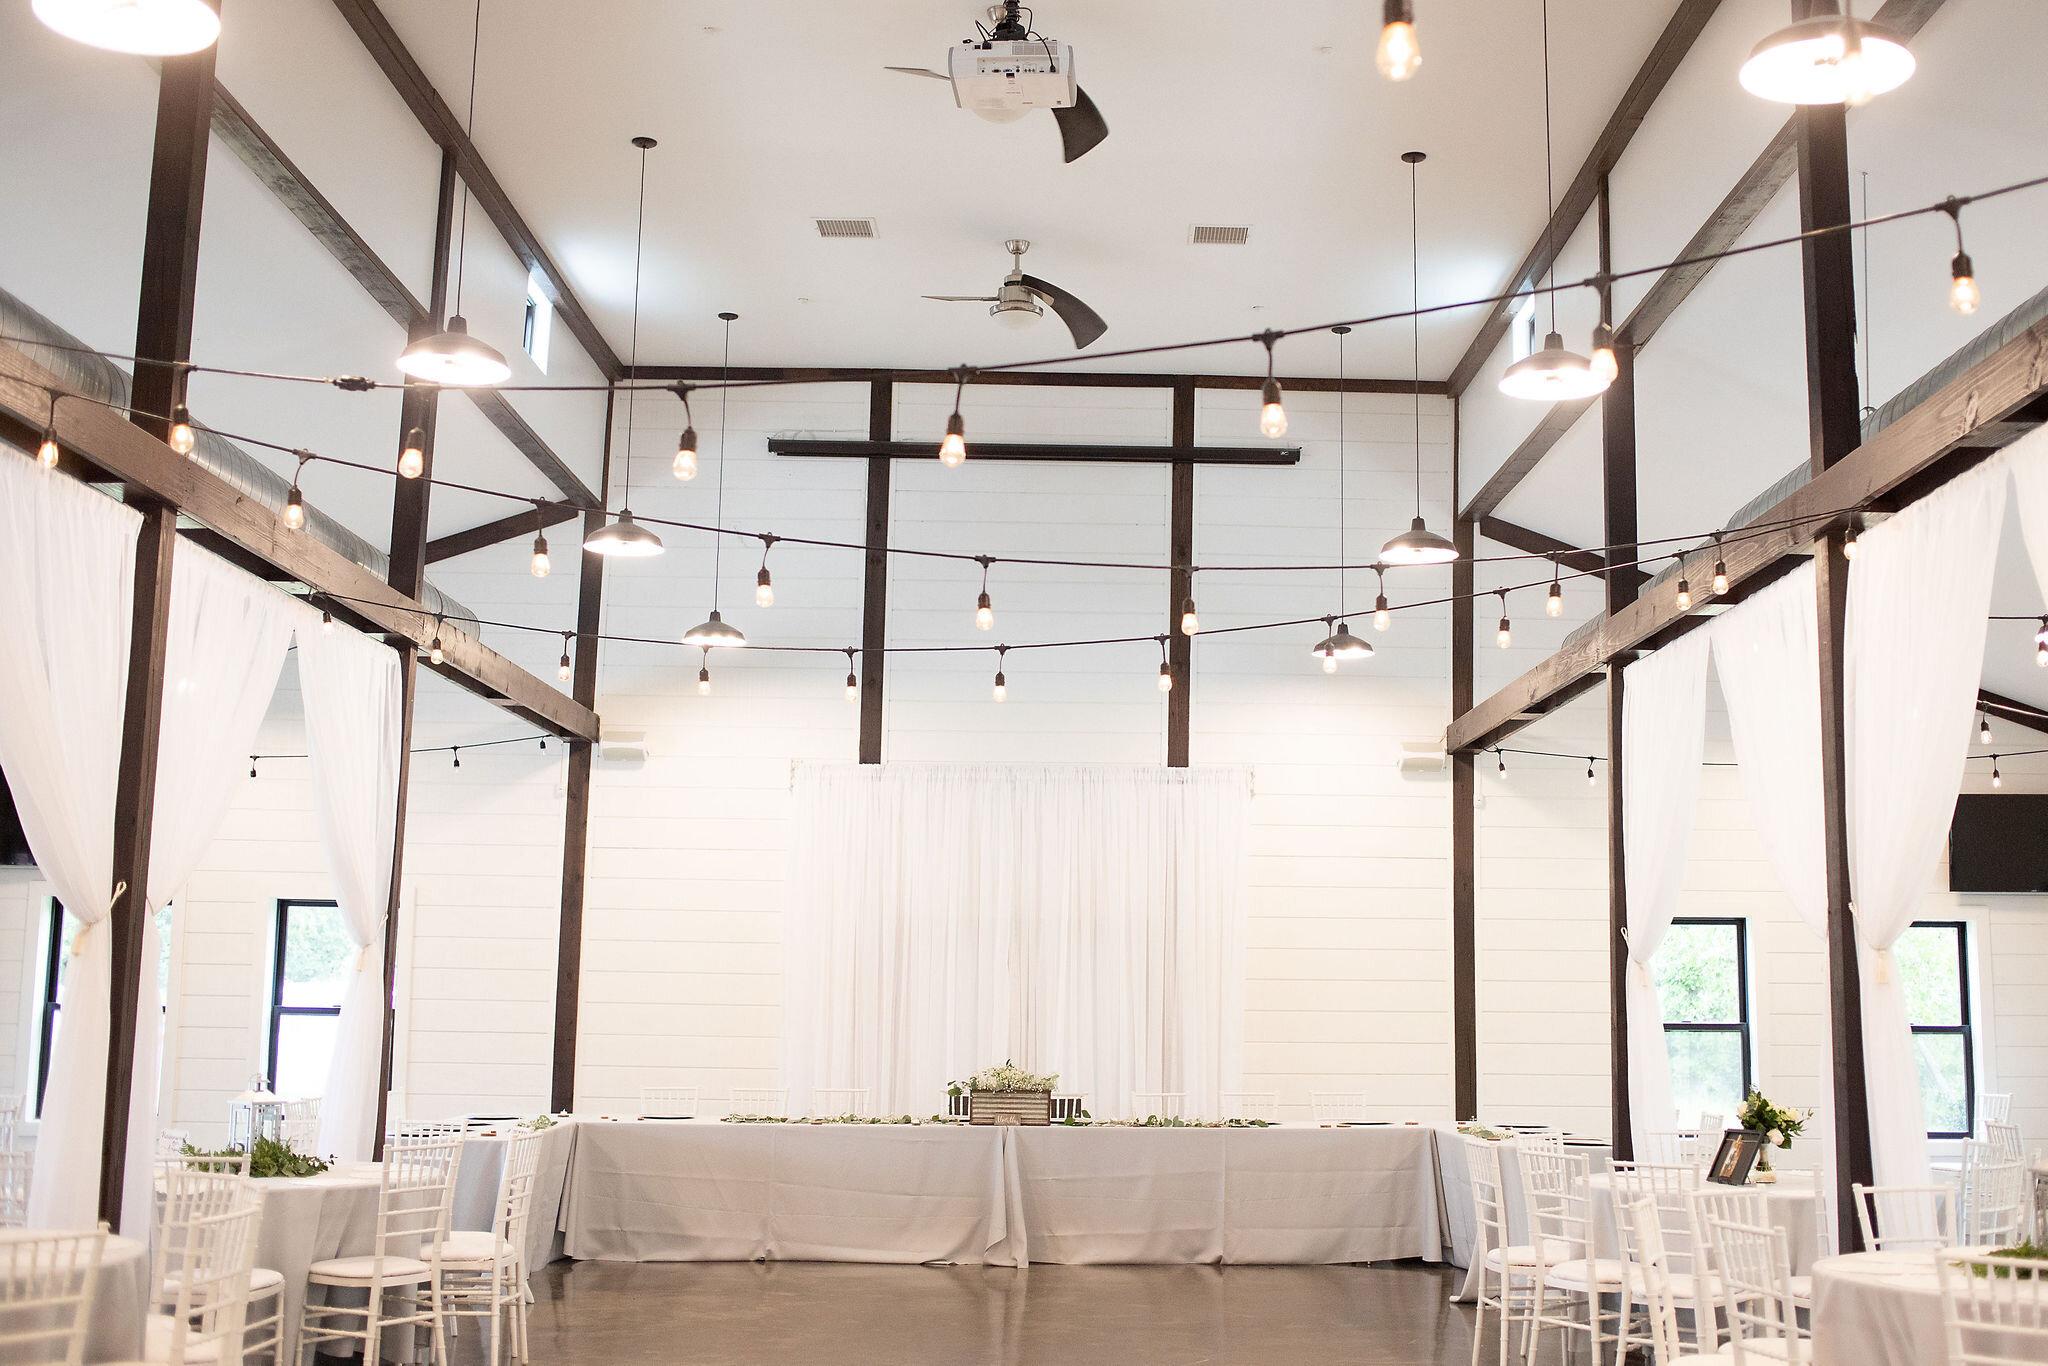 Oklahoma Summer Wedding Venue Dream Point Ranch 15.jpg